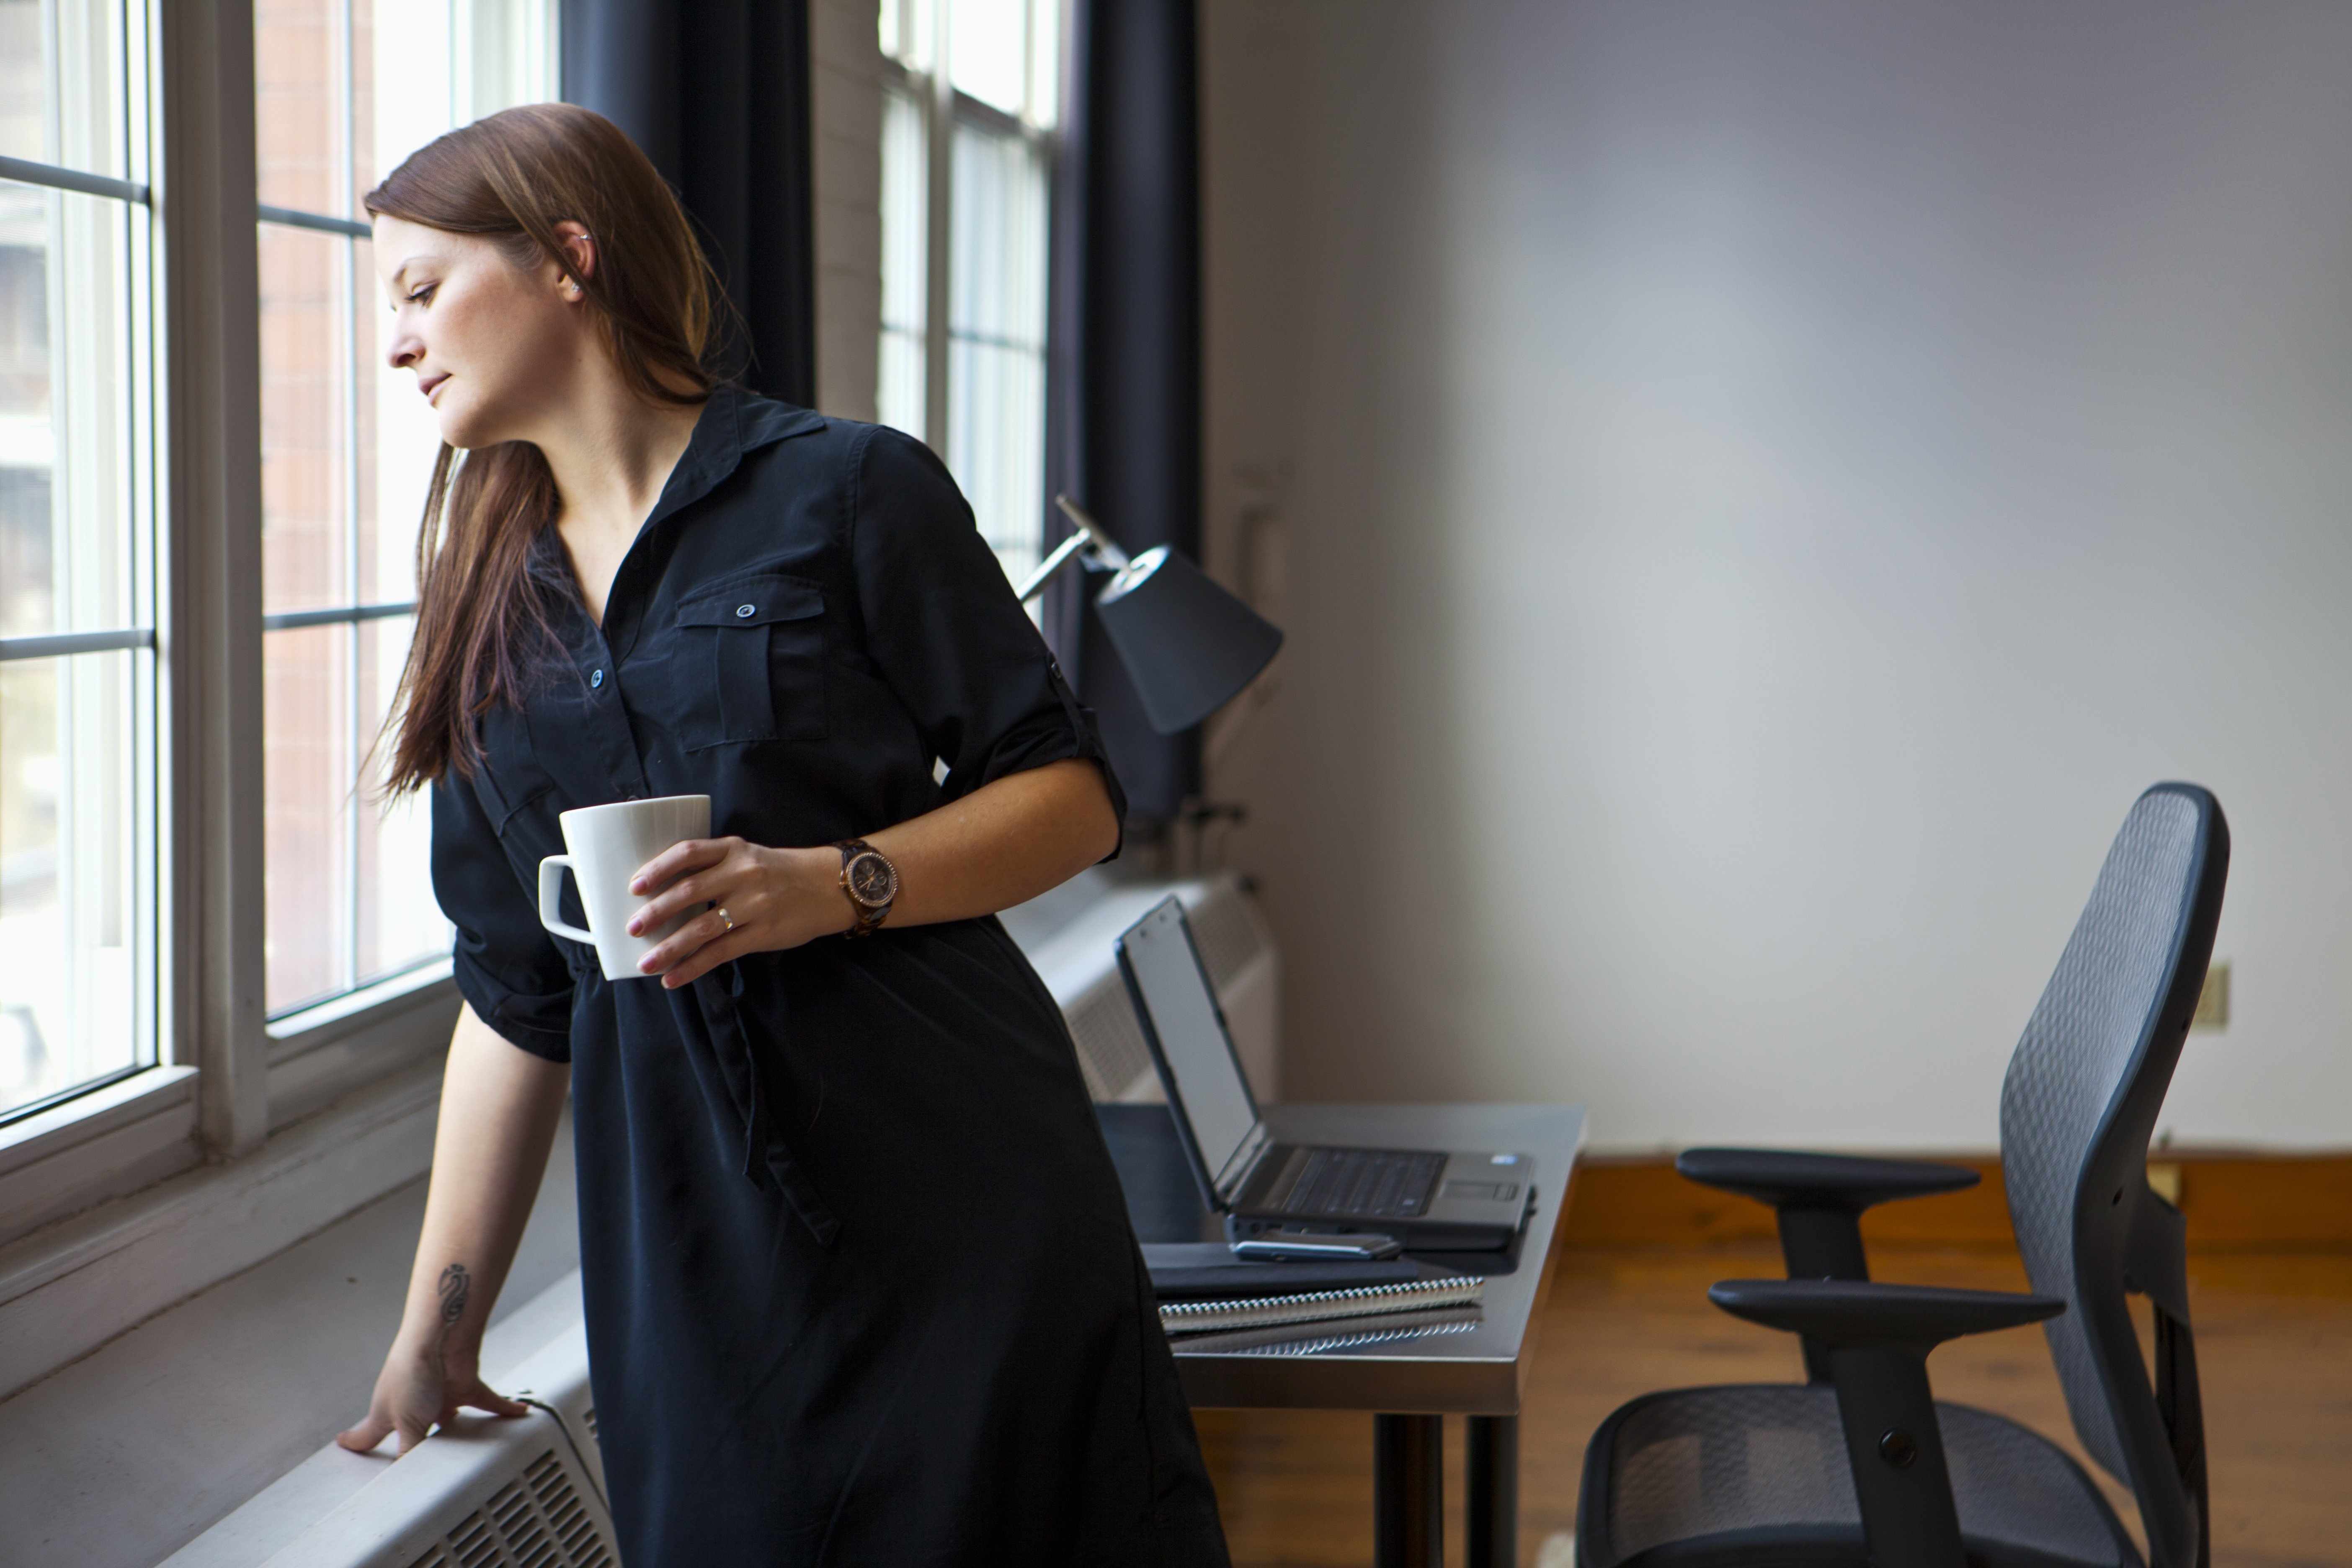 woman taking a break at work